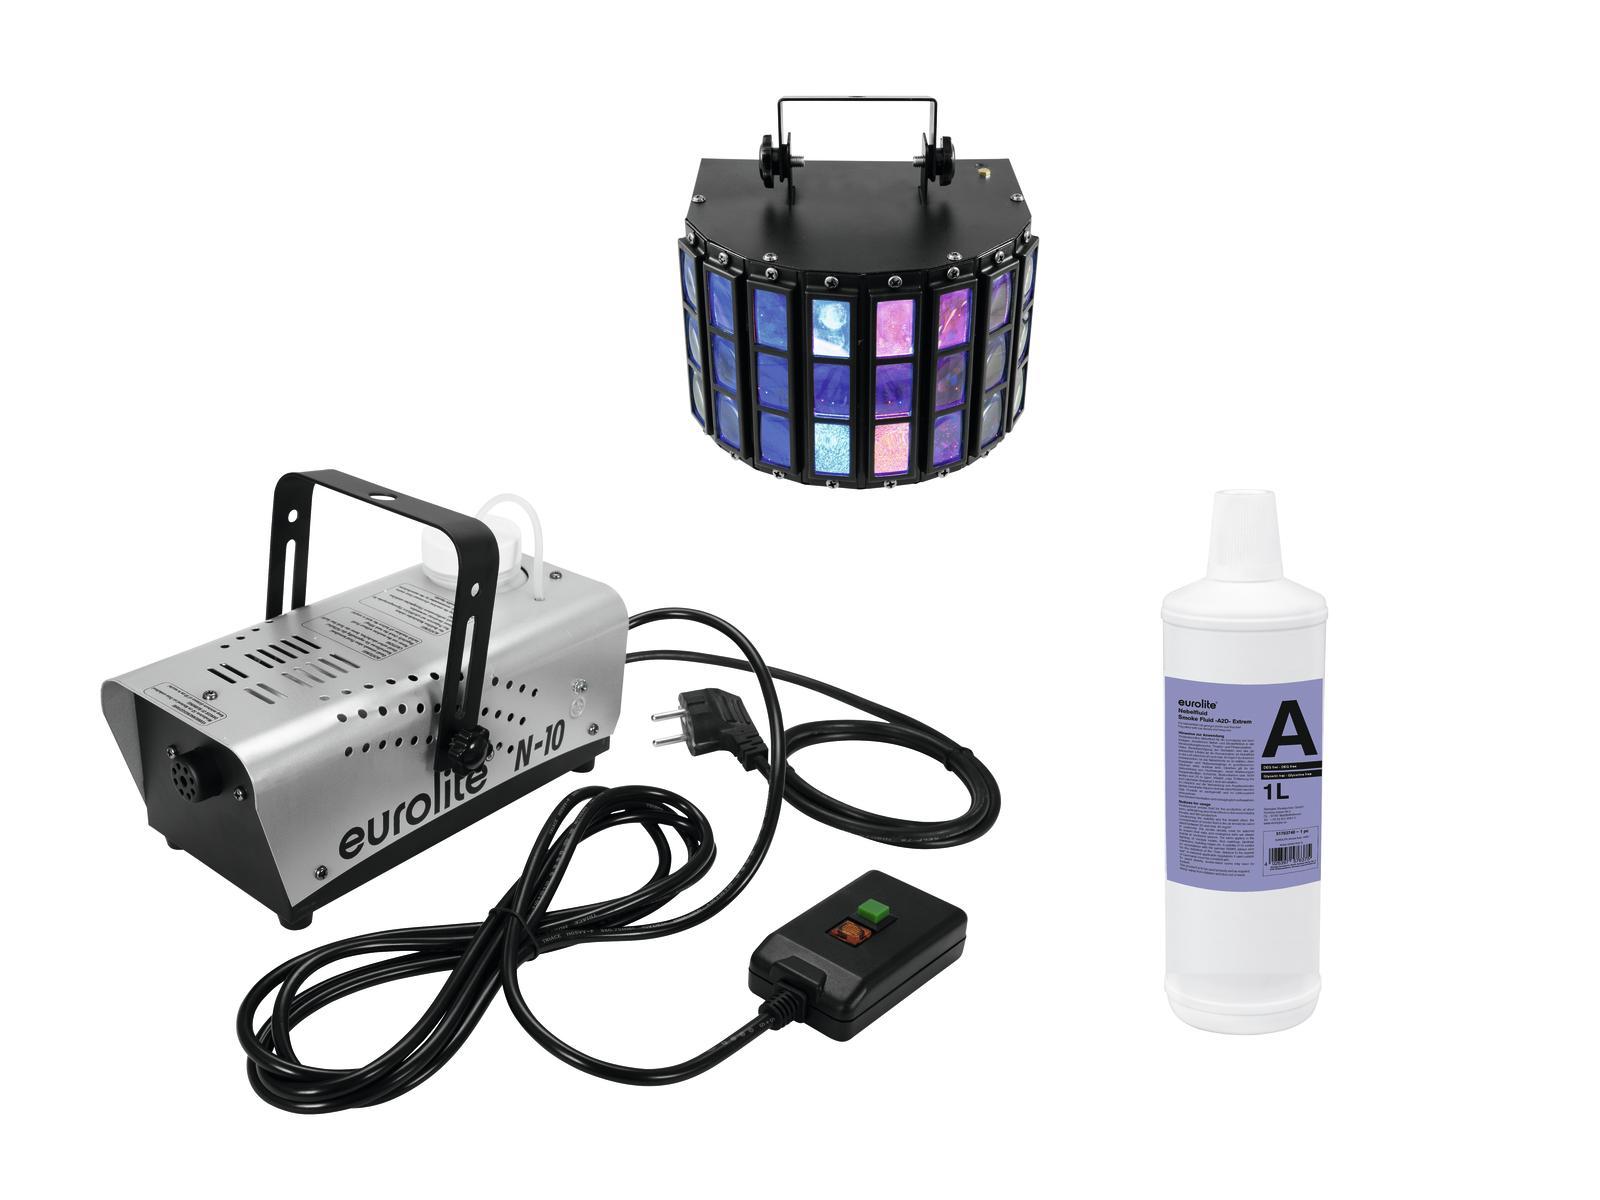 EUROLITE N Set-10 silber + A2D Liquido 1l + LED Mini D-5